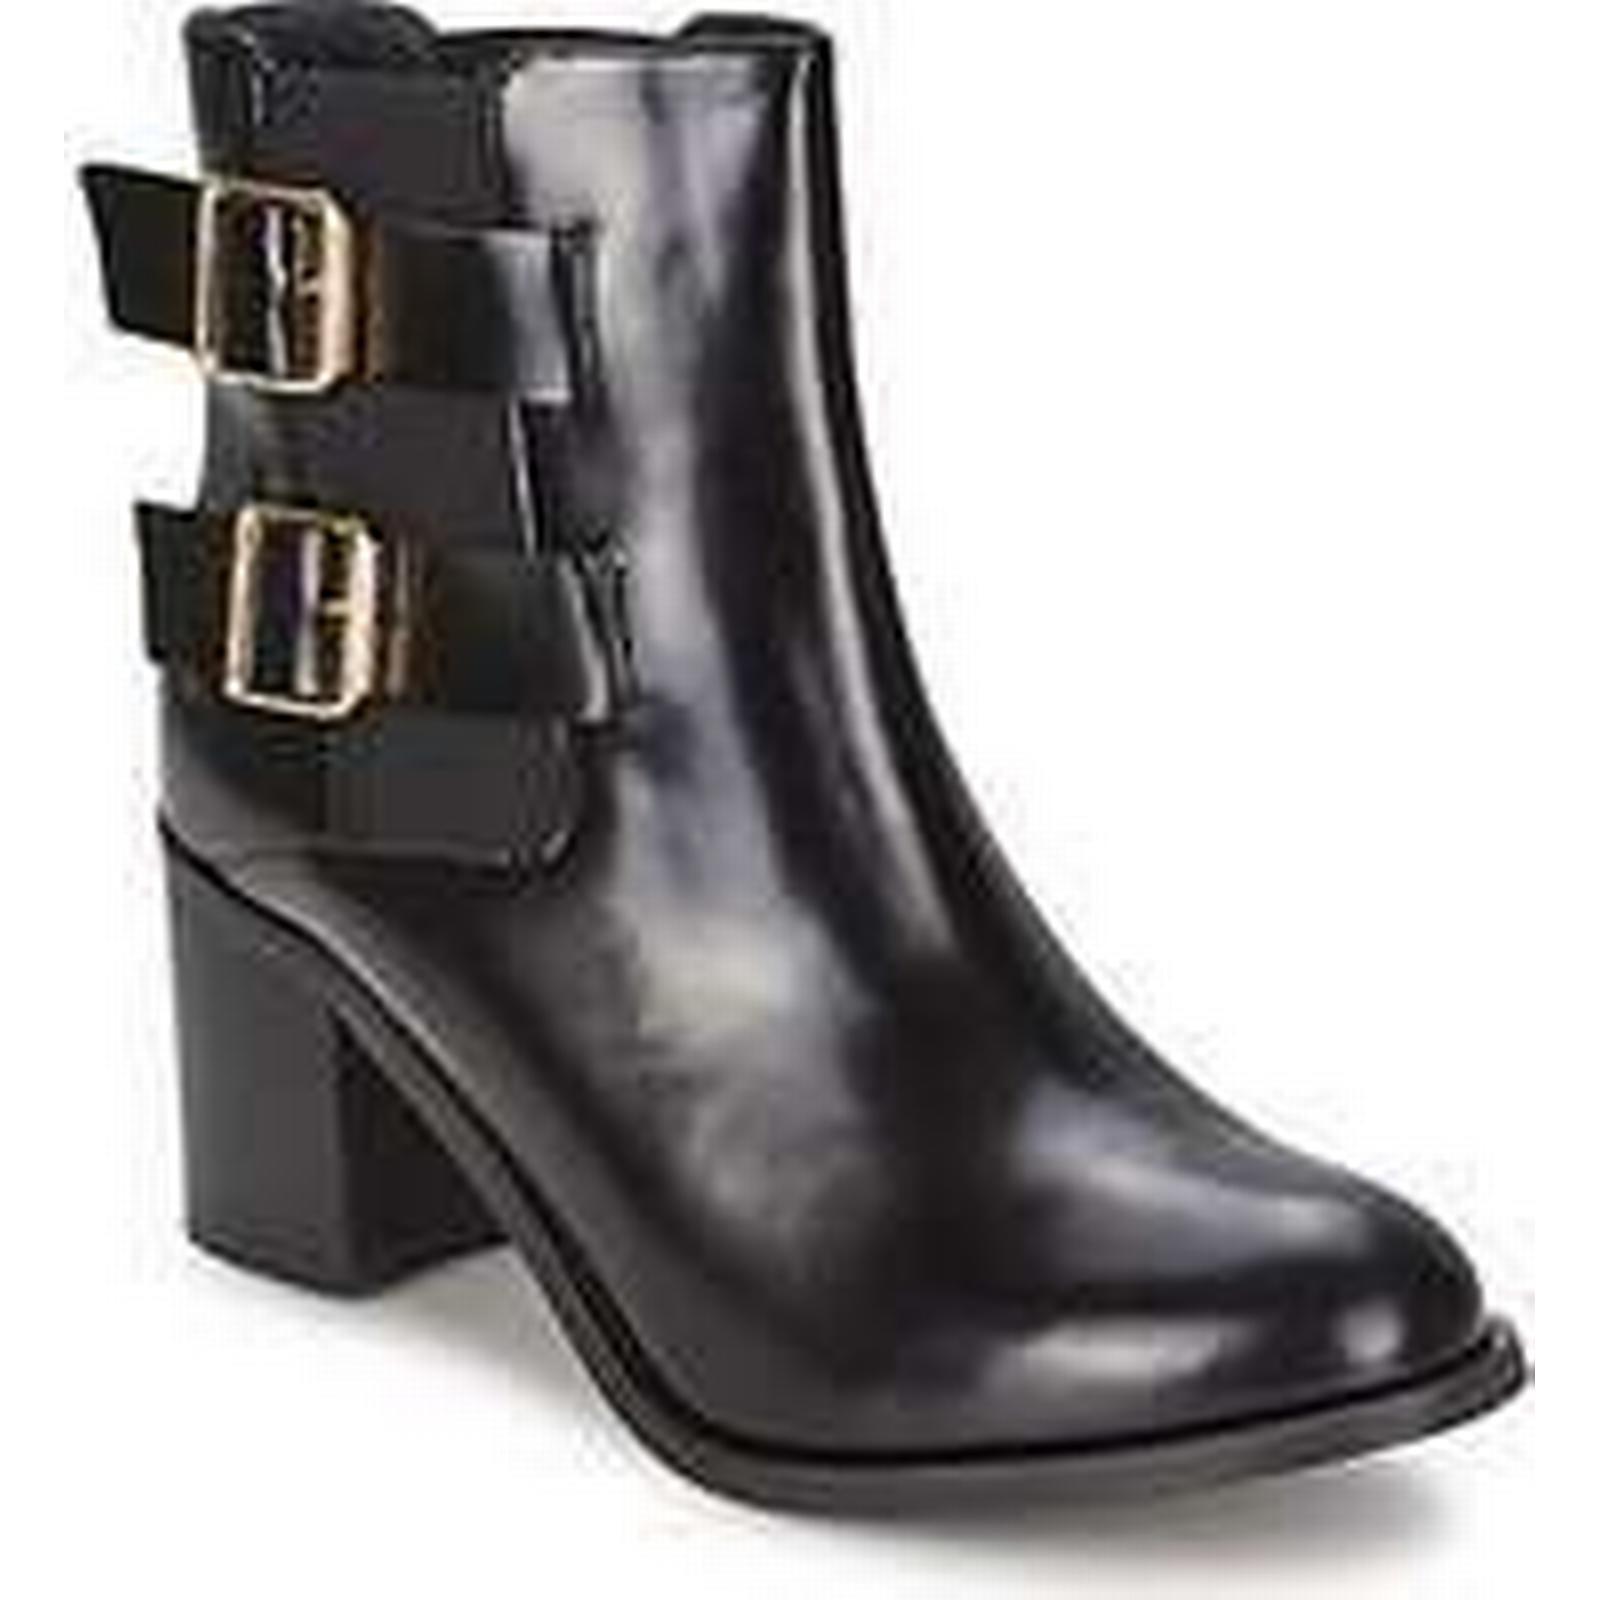 Spartoo.co.uk Jonak RAYA in women's Low Ankle Boots in RAYA Black a51ec0